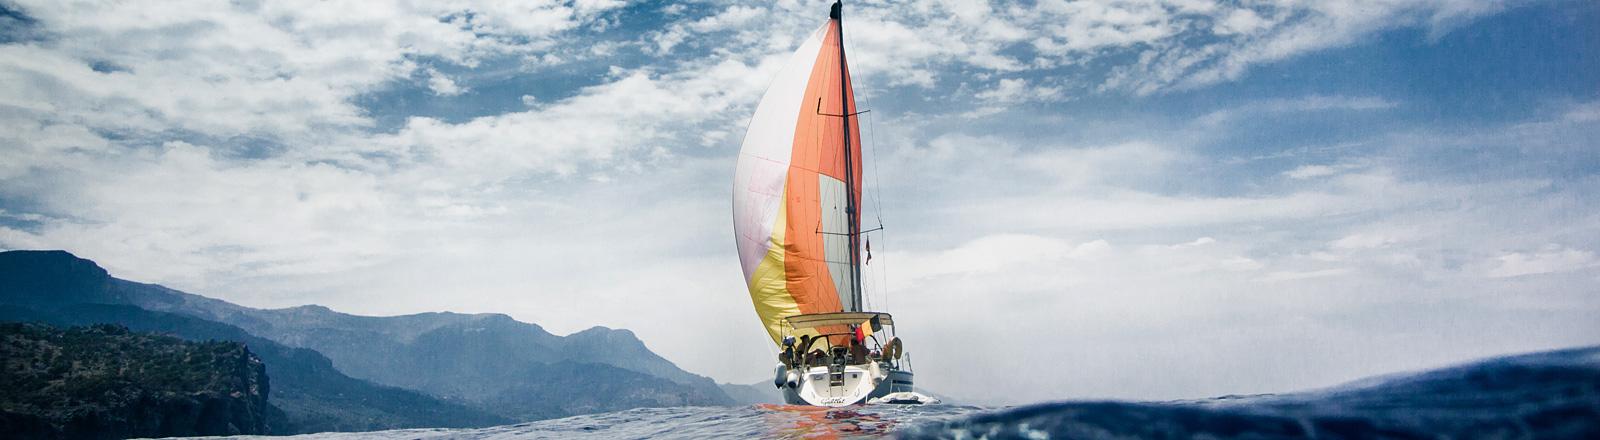 Seegelboot auf dem Meer